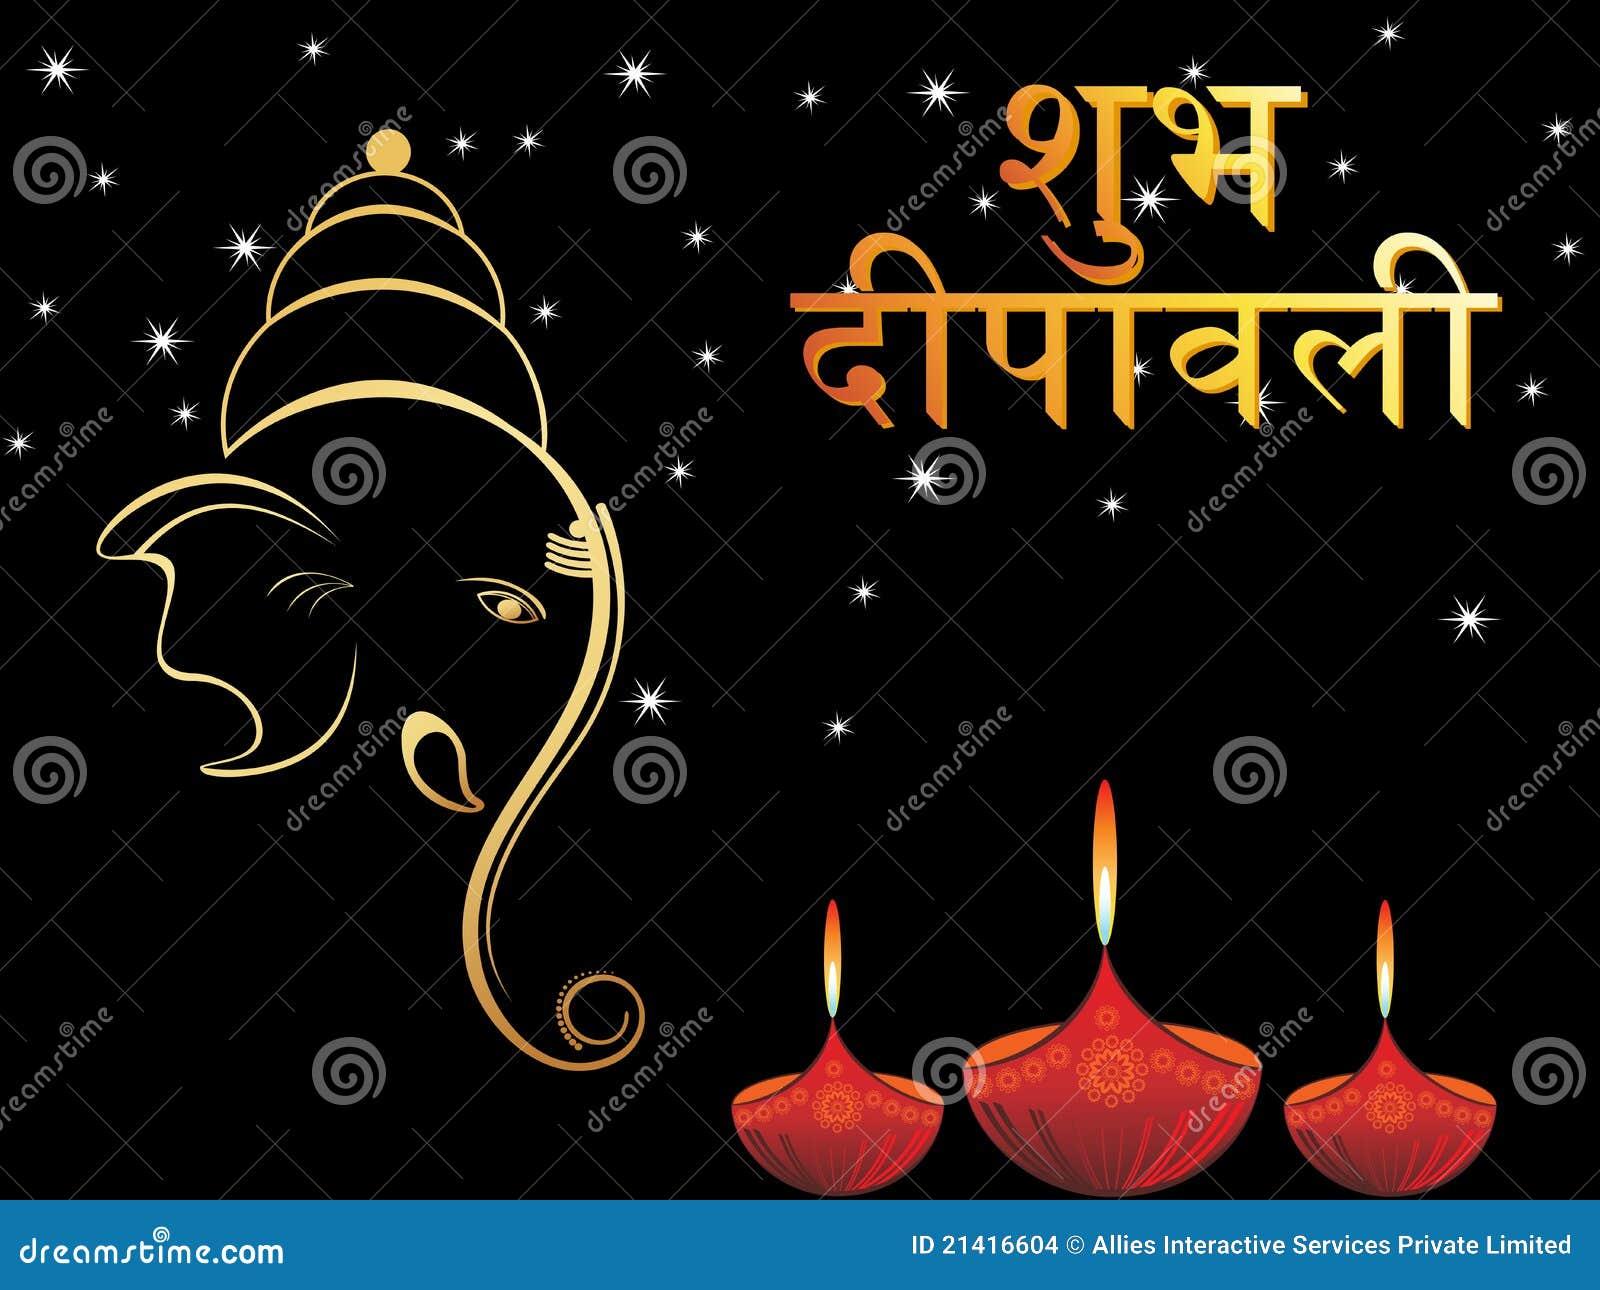 Beautiful Greeting Cards For Diwali Celebration Stock Illustration